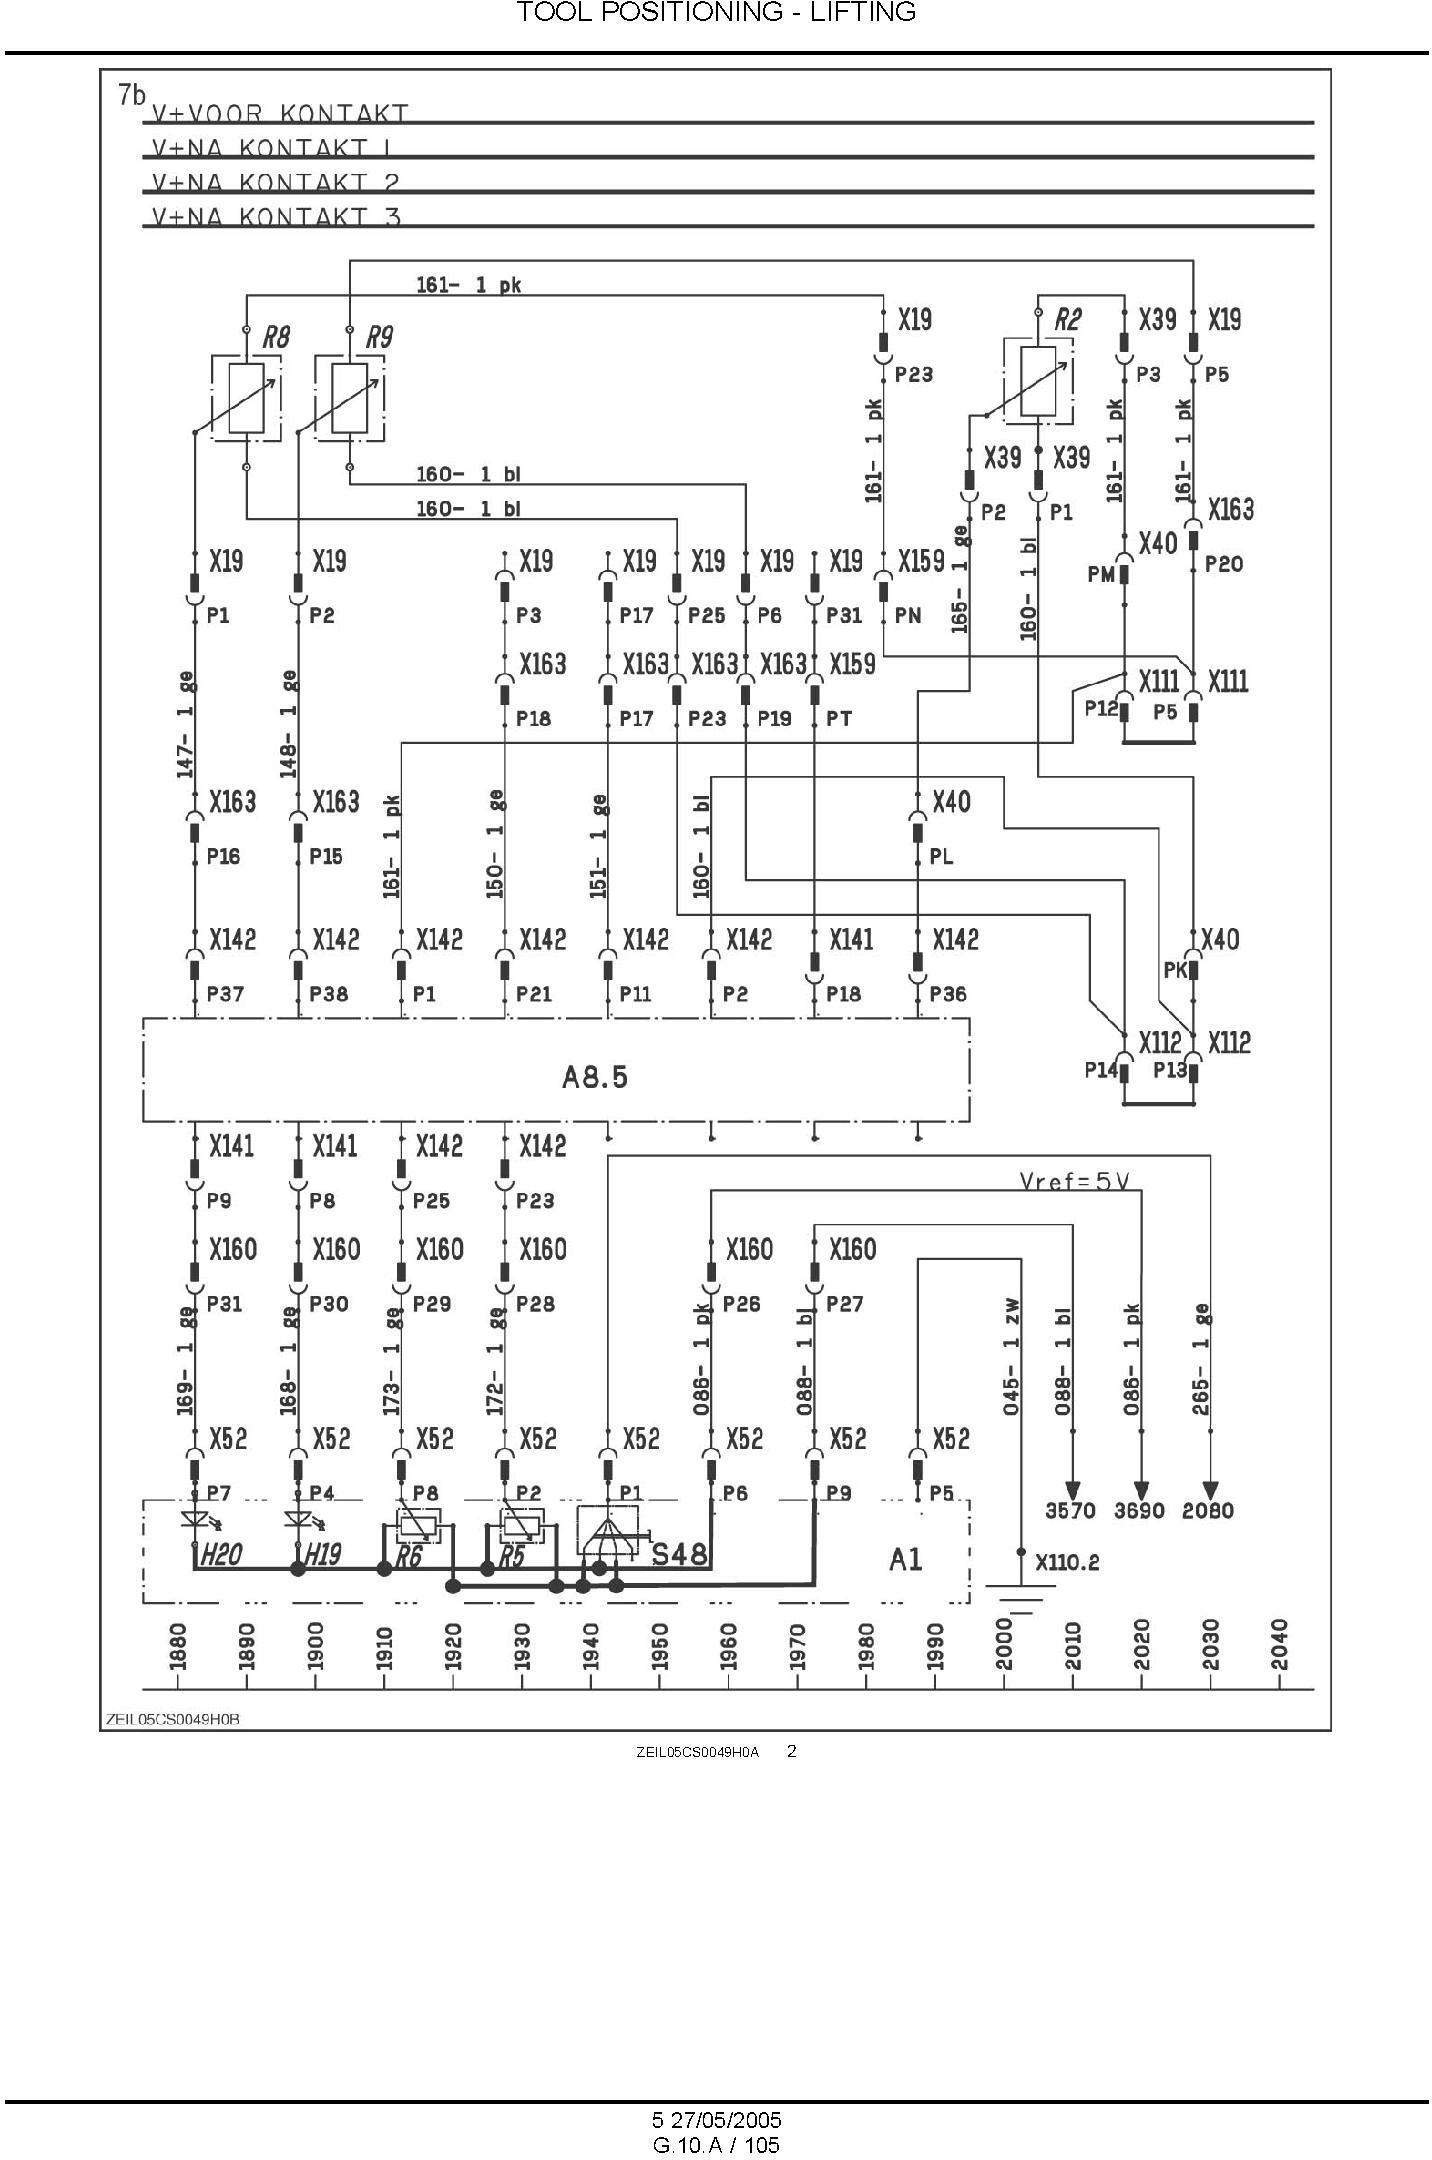 New Holland CS520, CS540, CS640, CS660, CL560 Combine Service Manual - 3